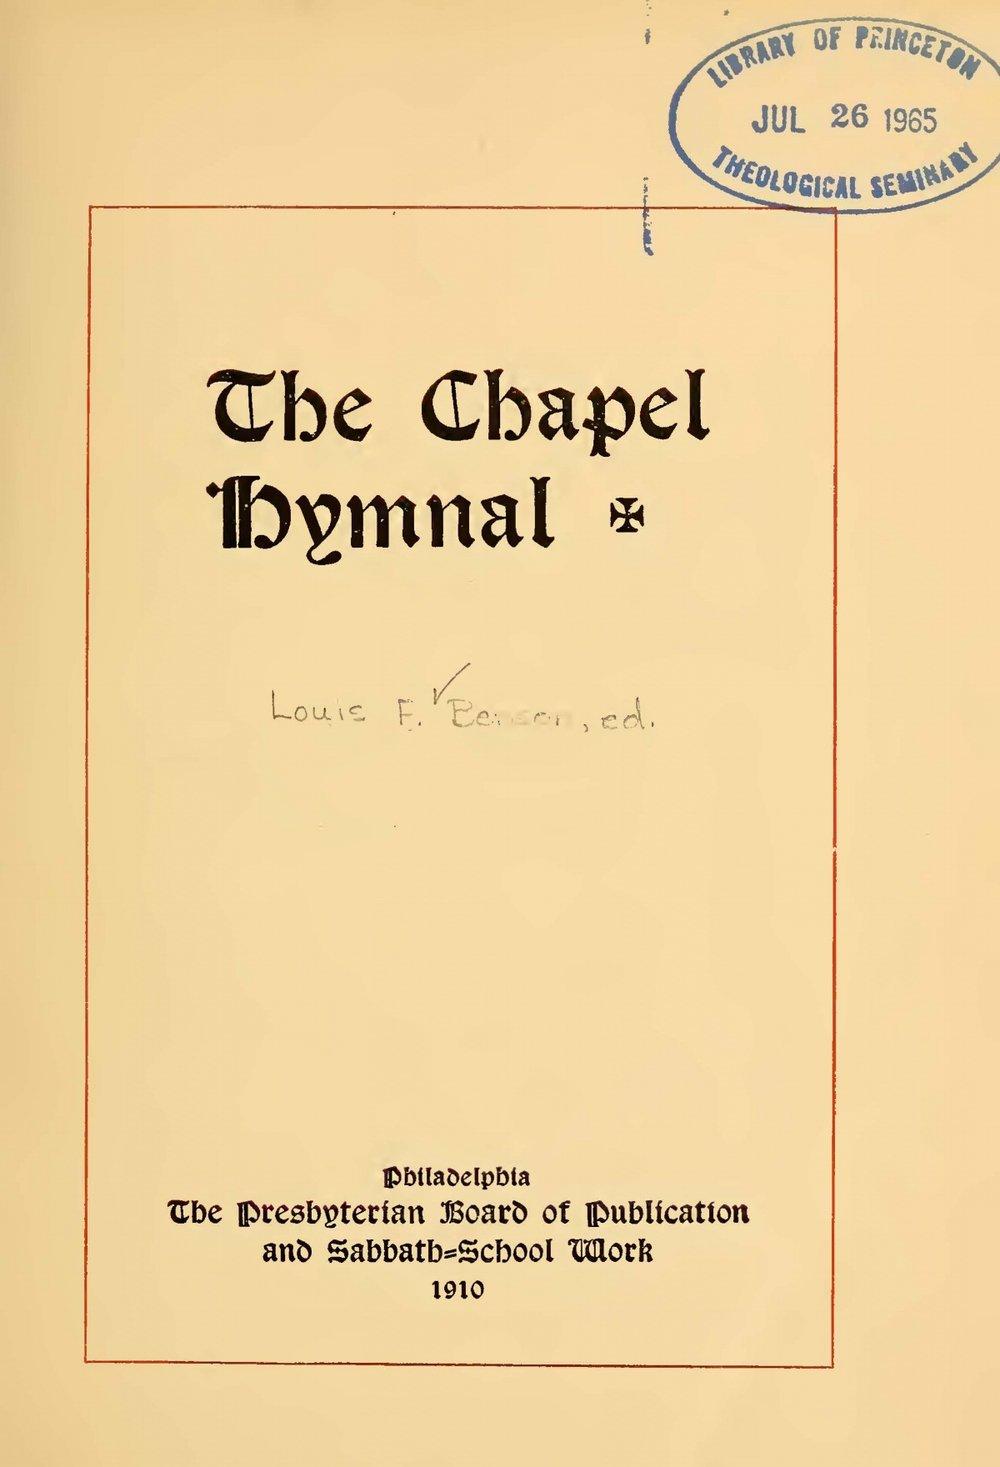 Benson, Louis FitzGerald, The Chapel Hymnal Title Page.jpg